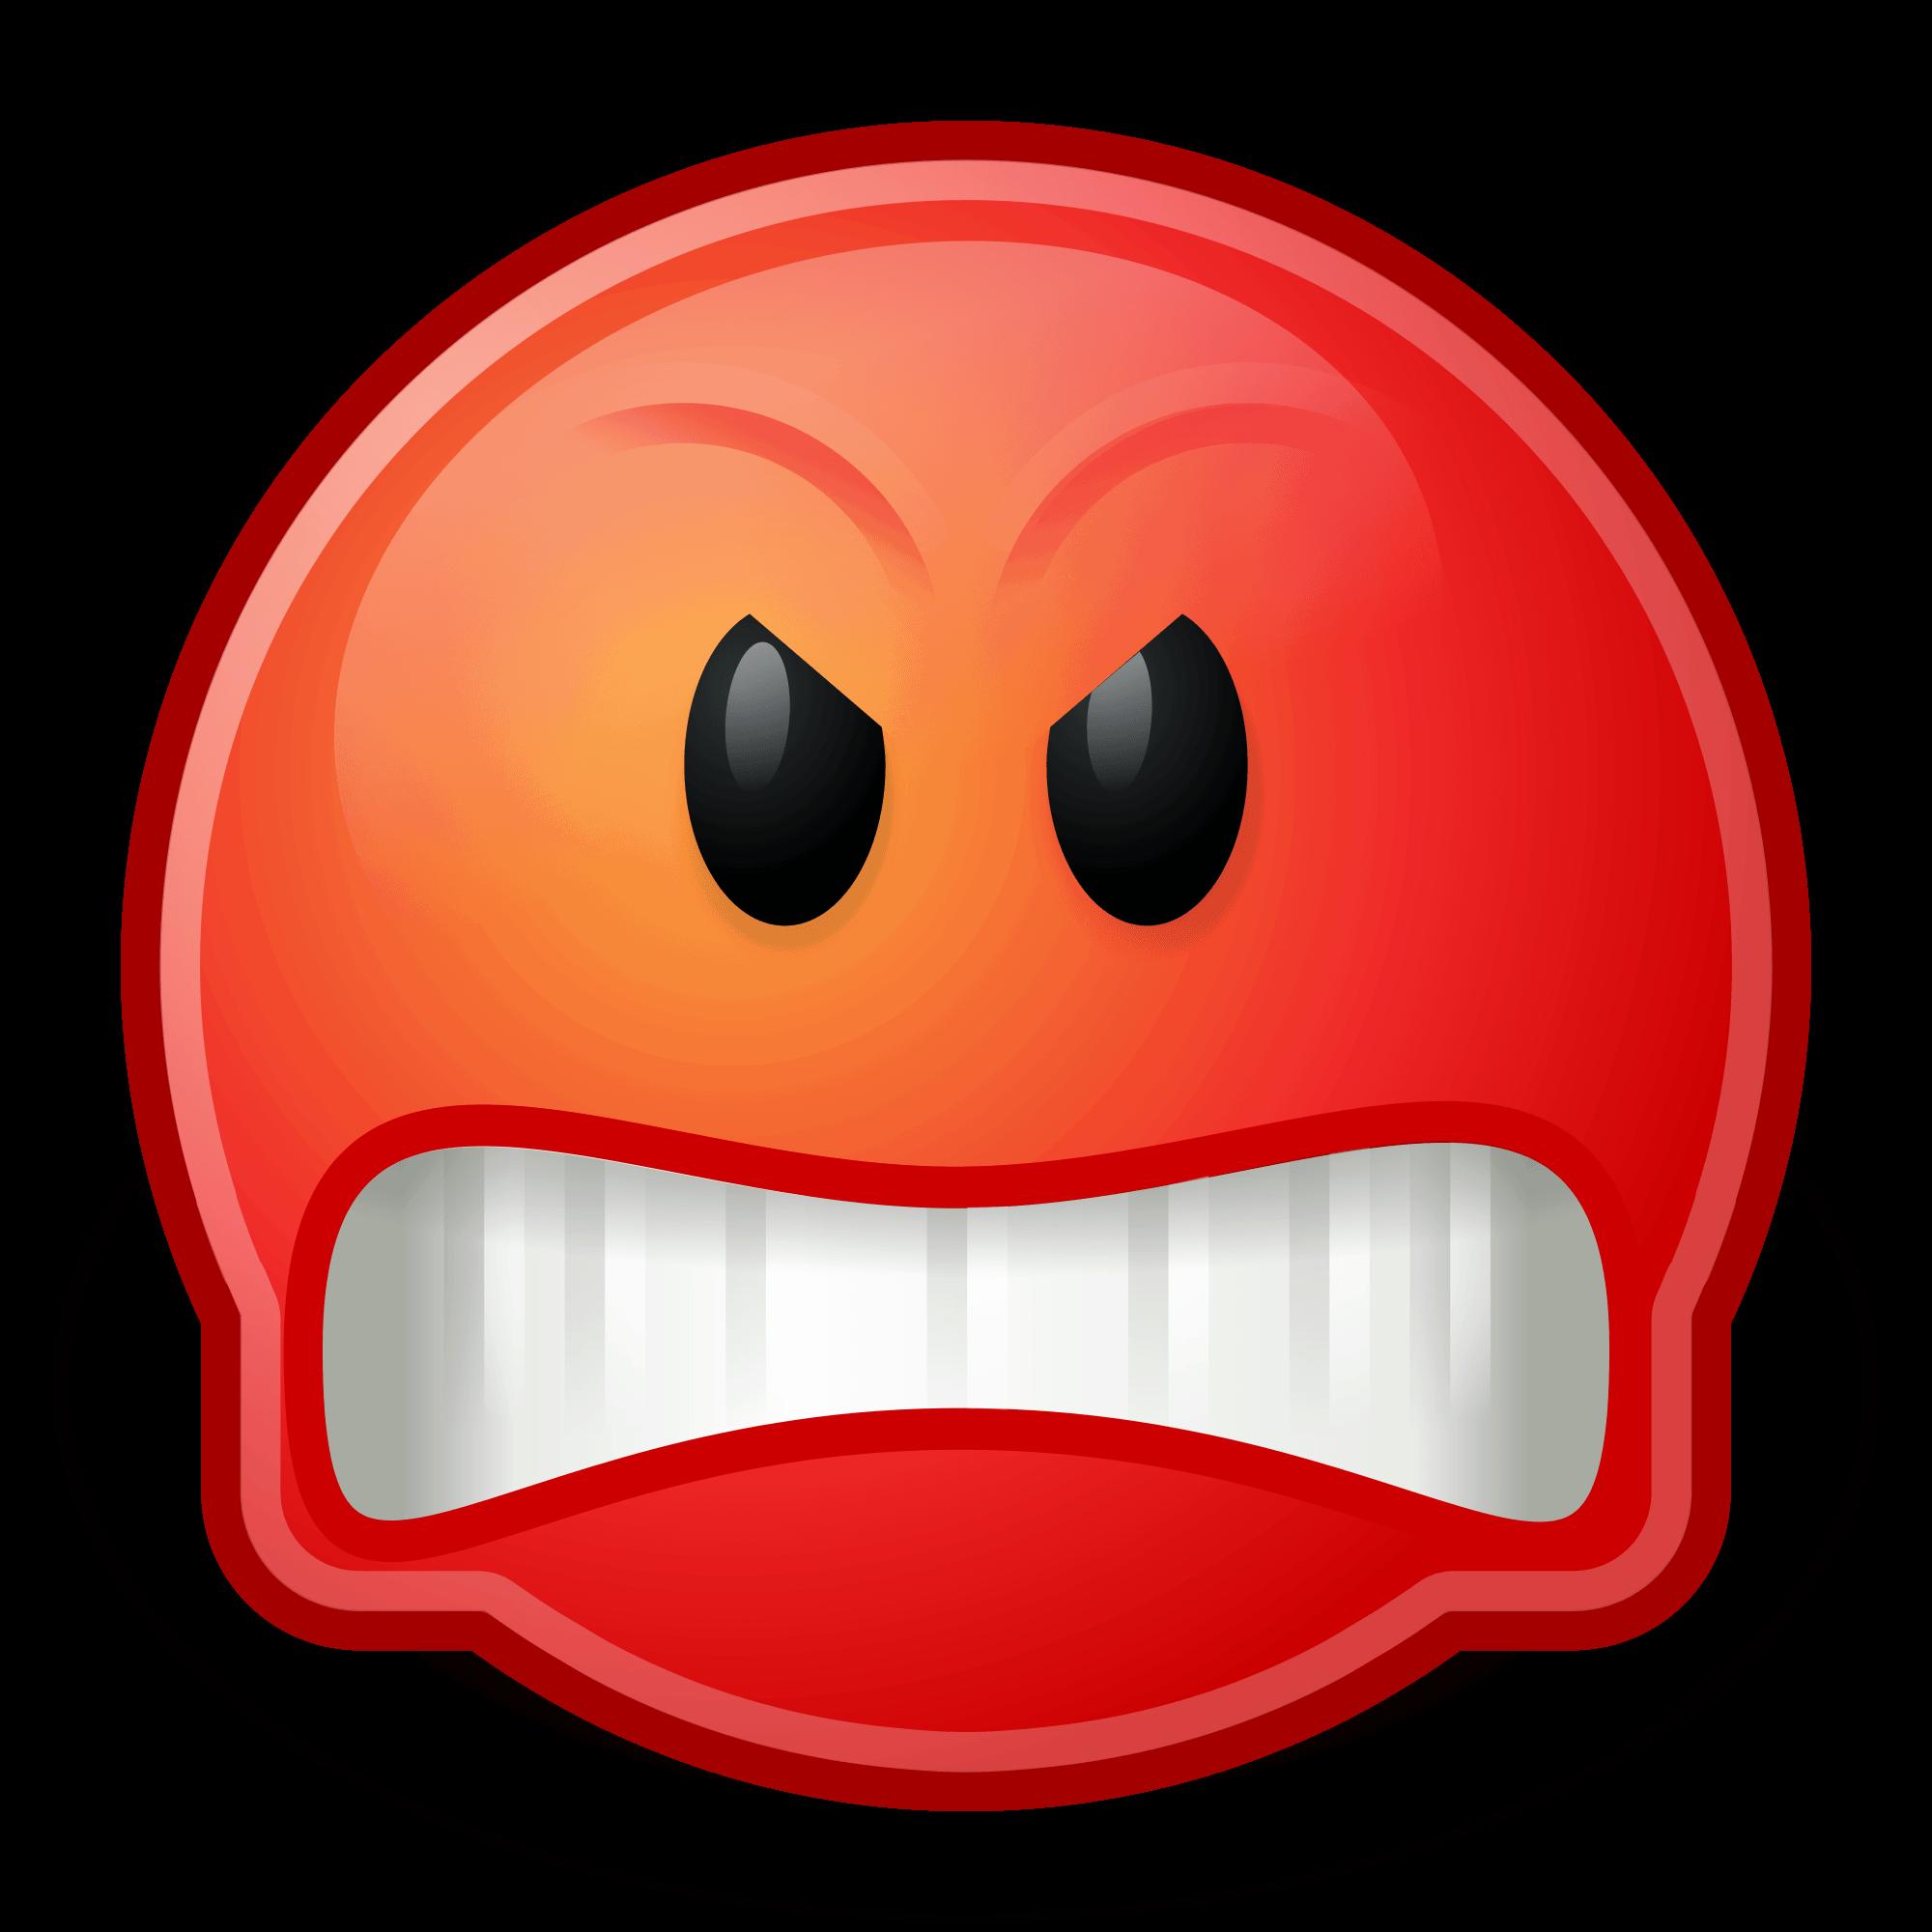 Computer icons clip art. Emoji clipart anger